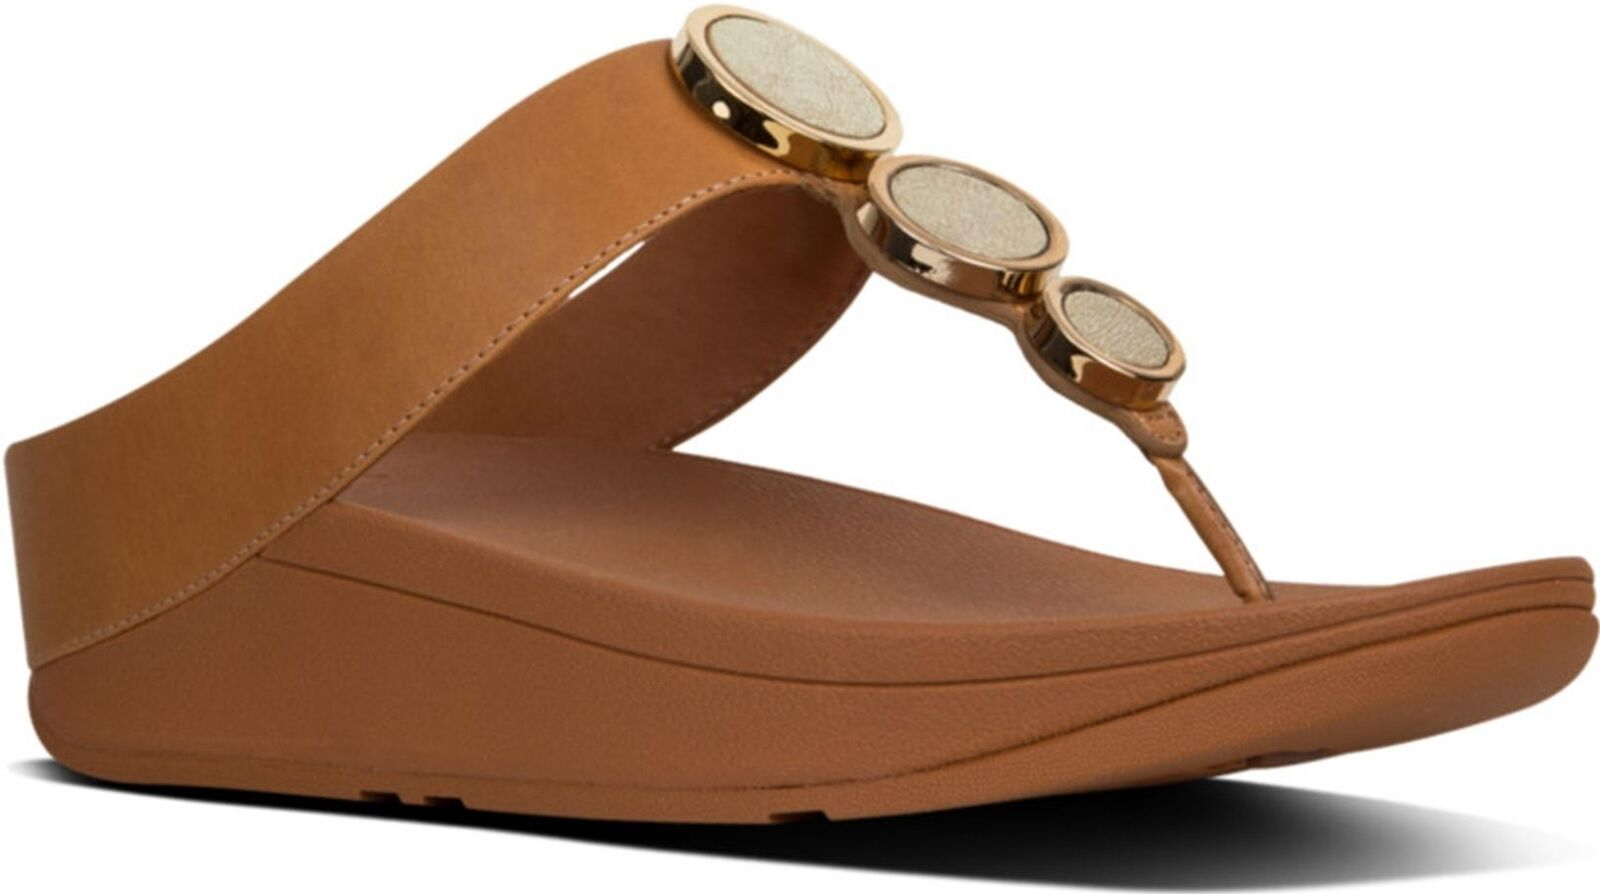 d77d3e9459af00 FitFlop Women s Halo Toe Post Leather Sandal Rose Gold UK 7 for sale ...